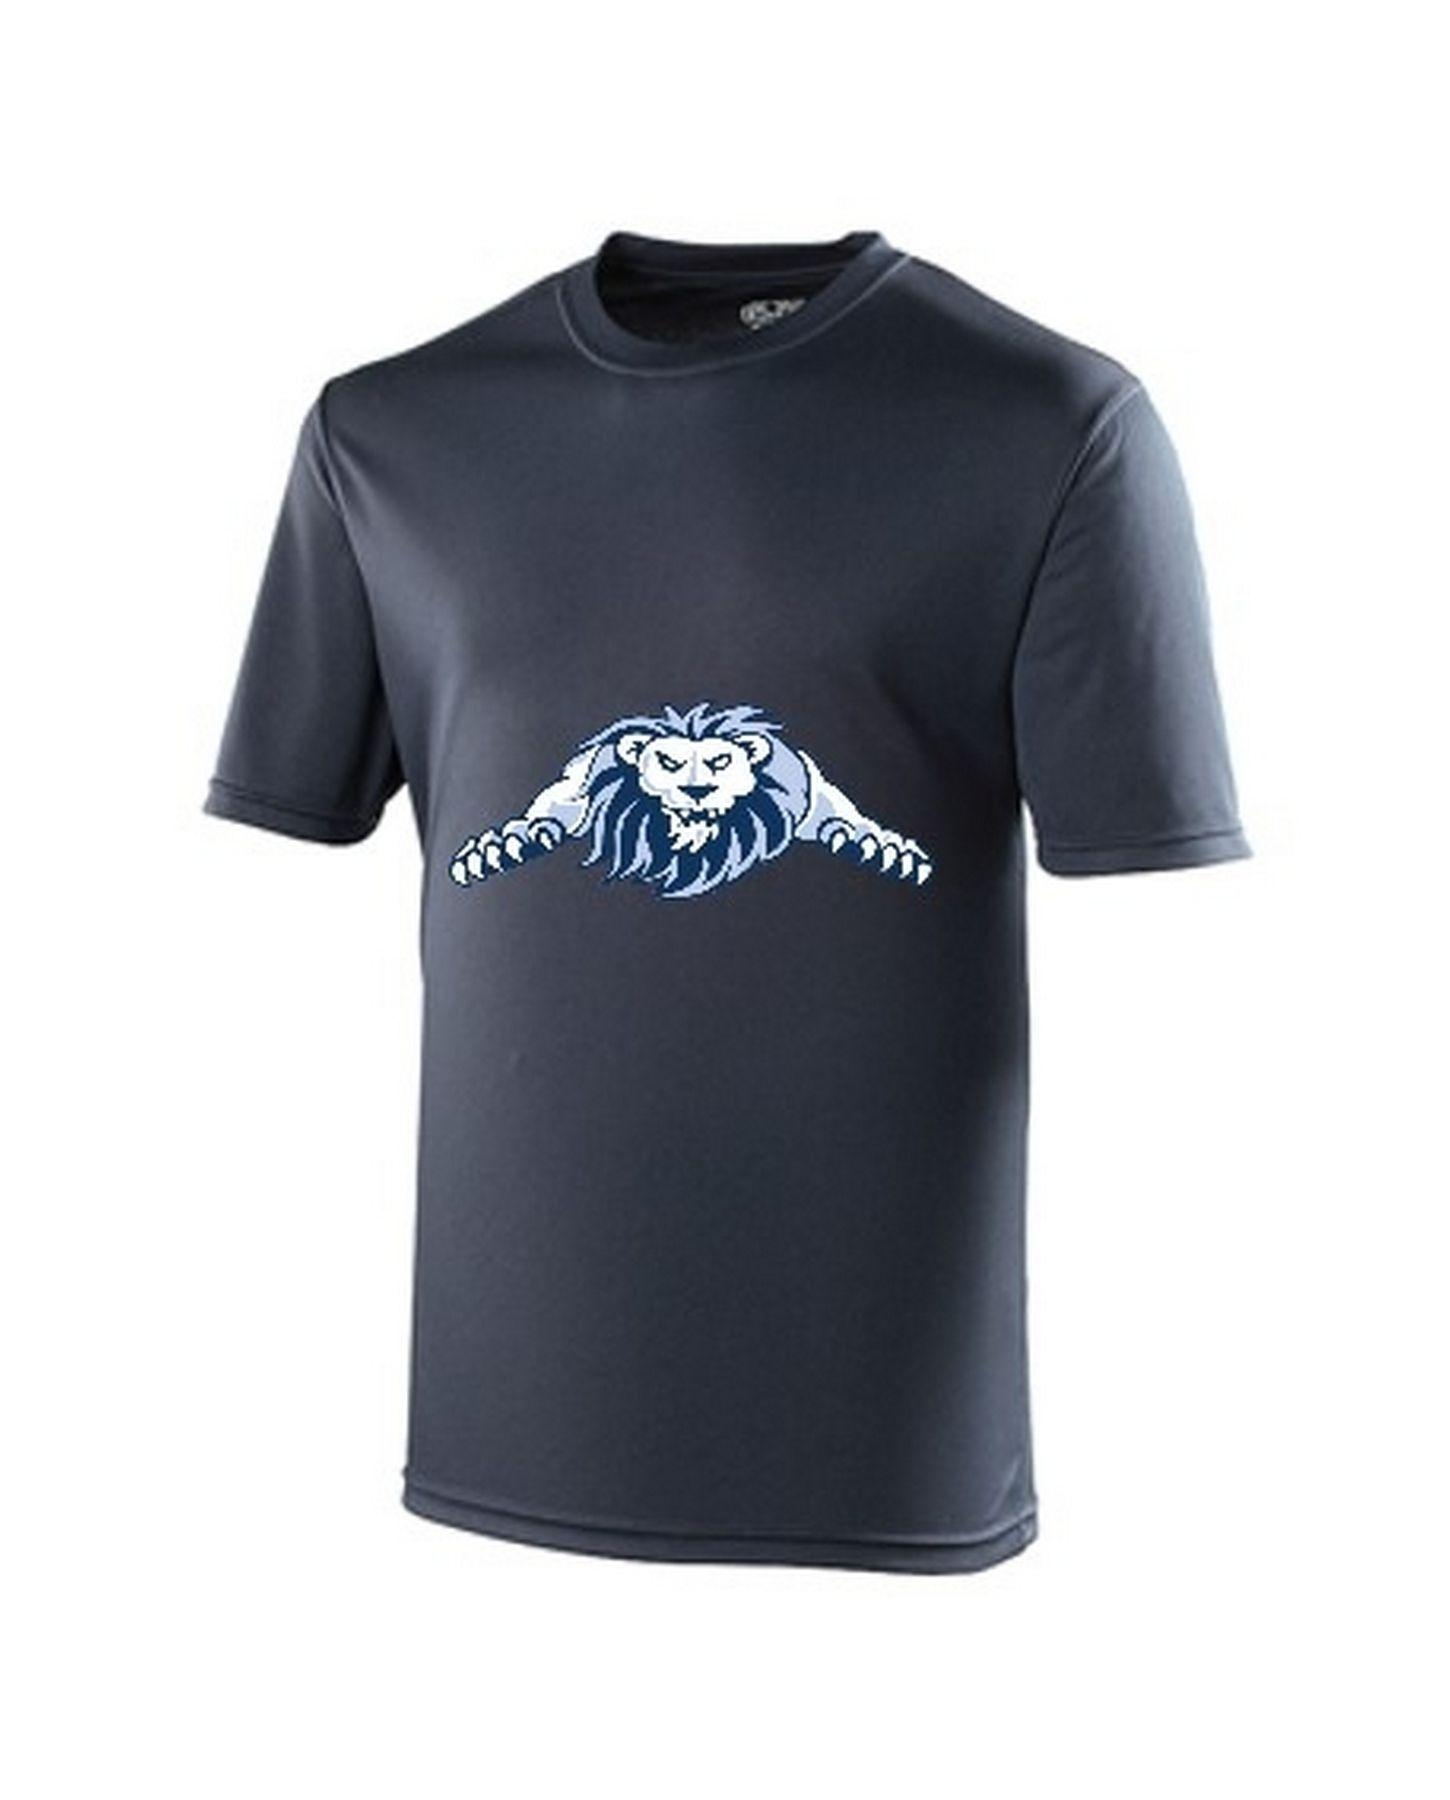 Littleport Lions Korfball – Kit Top